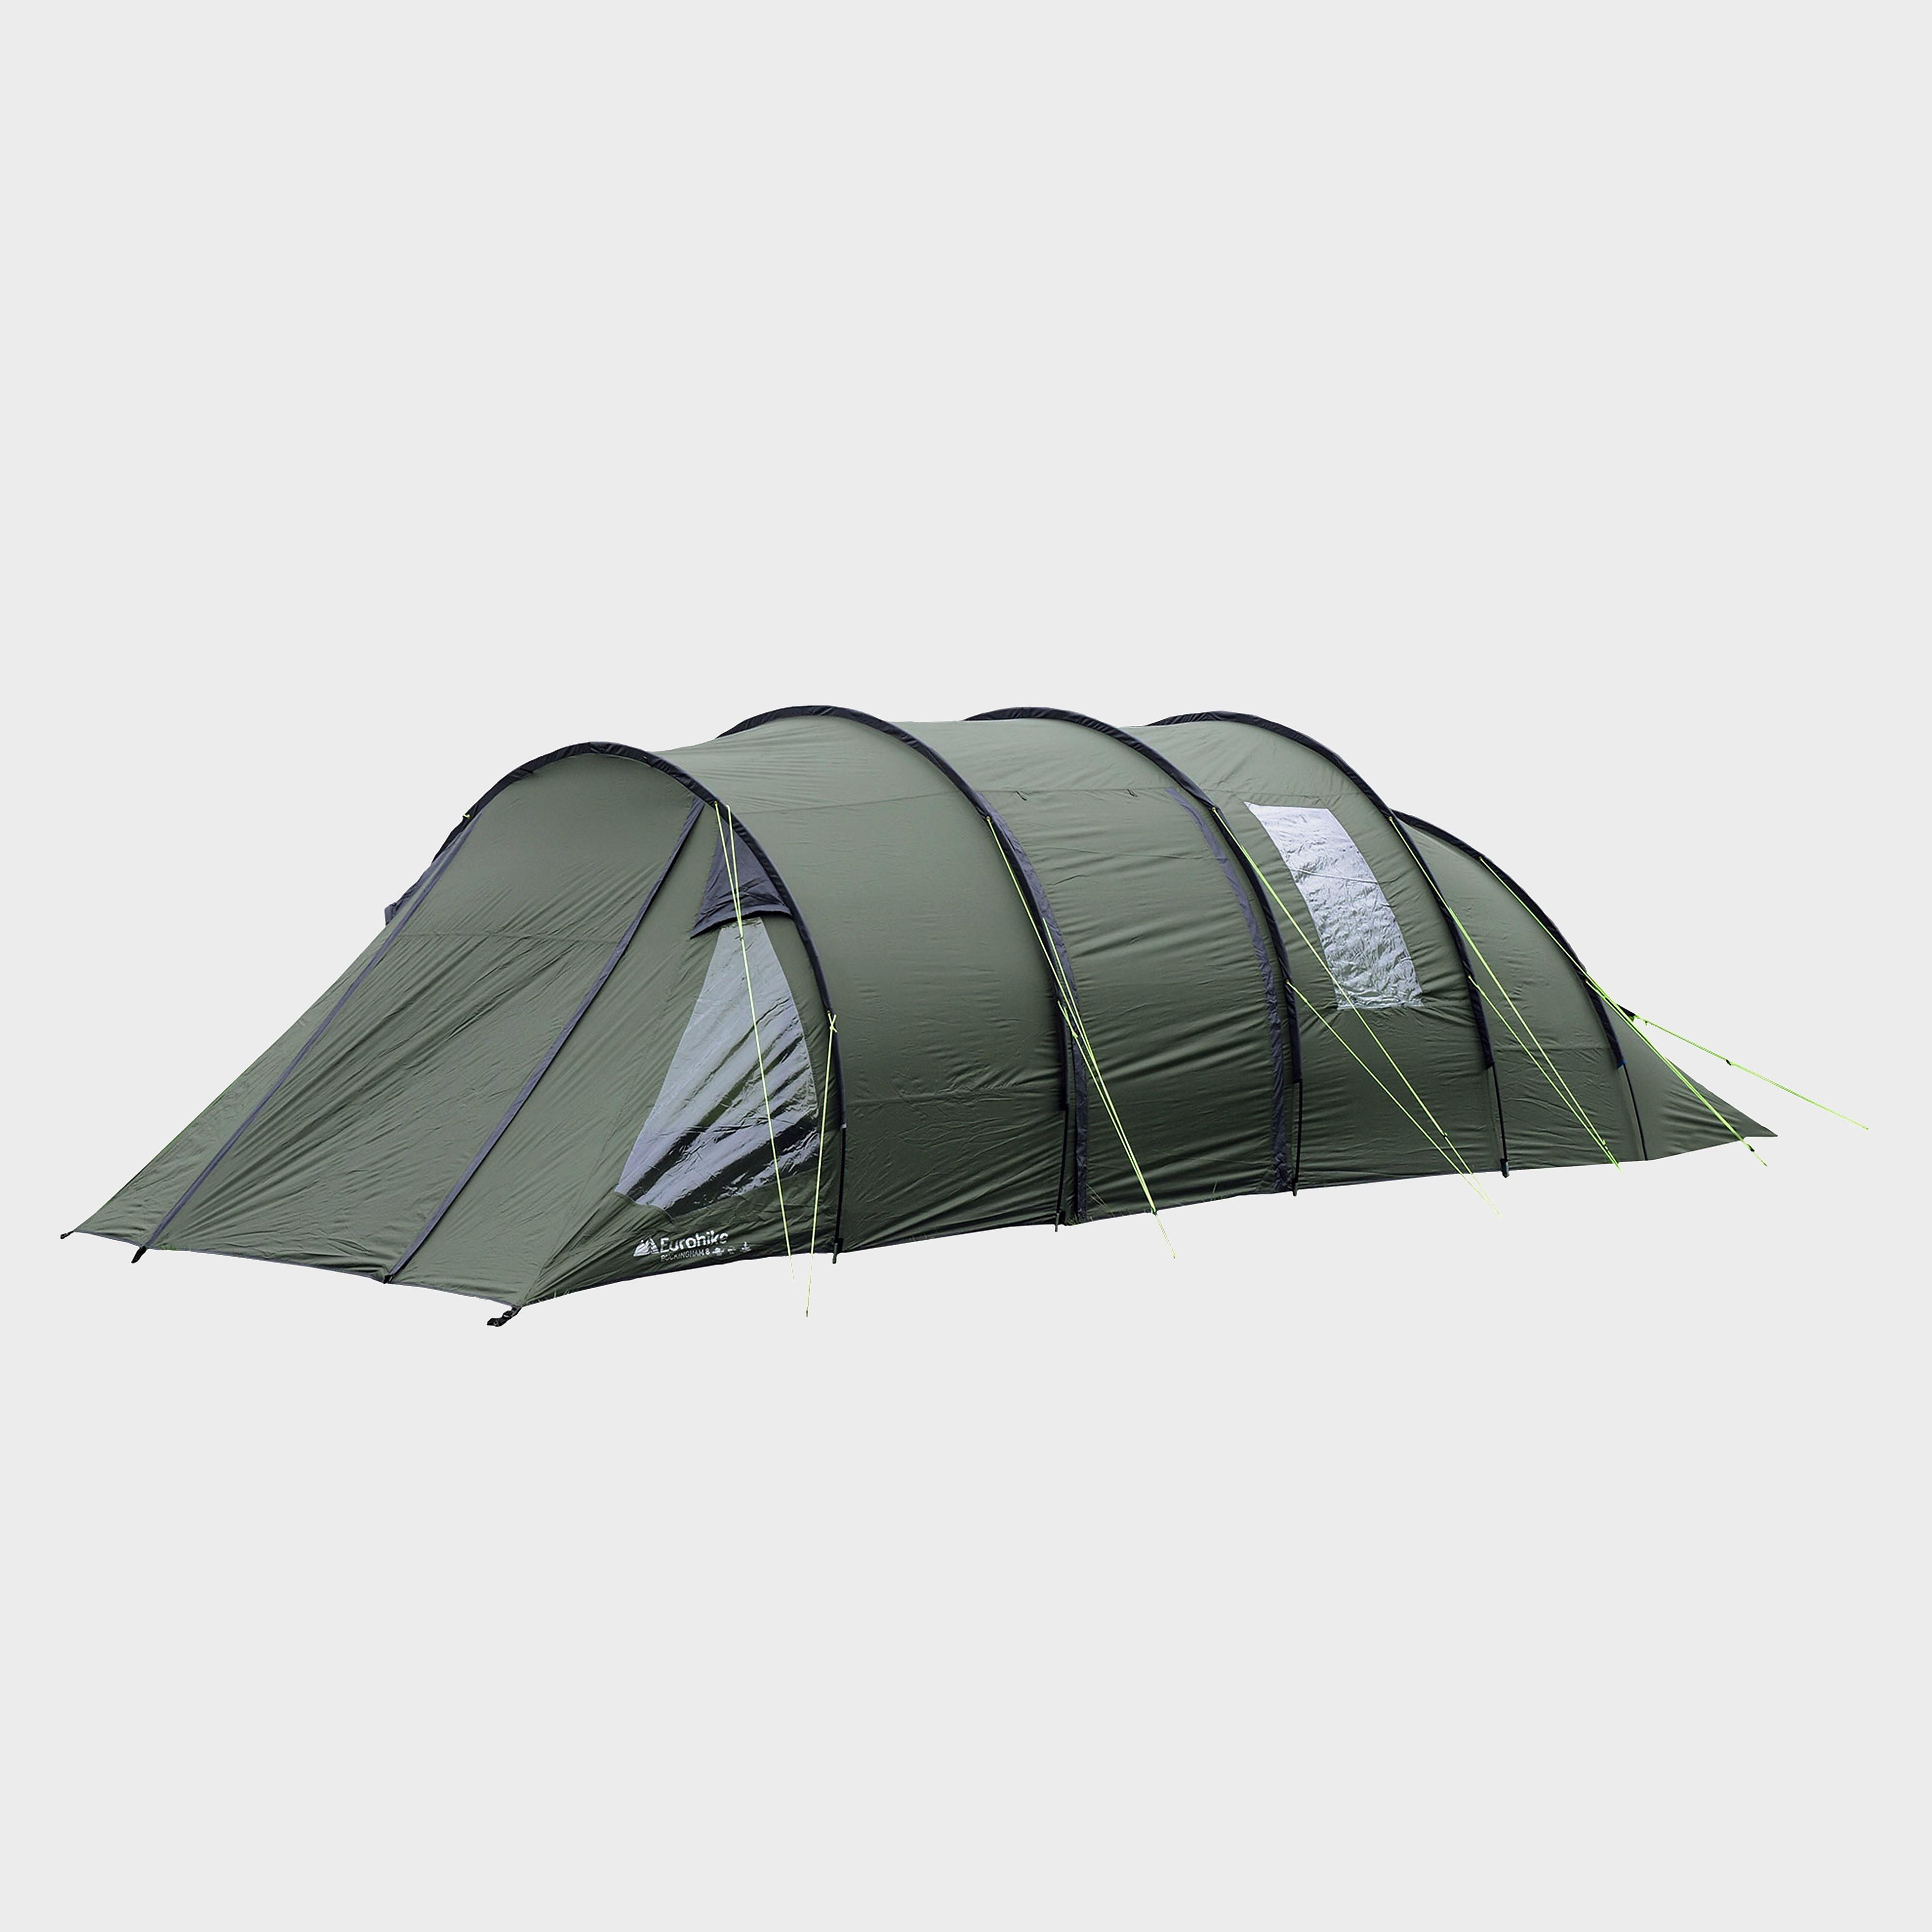 Eurohike Buckingham 8 Classic 8 Man Tent